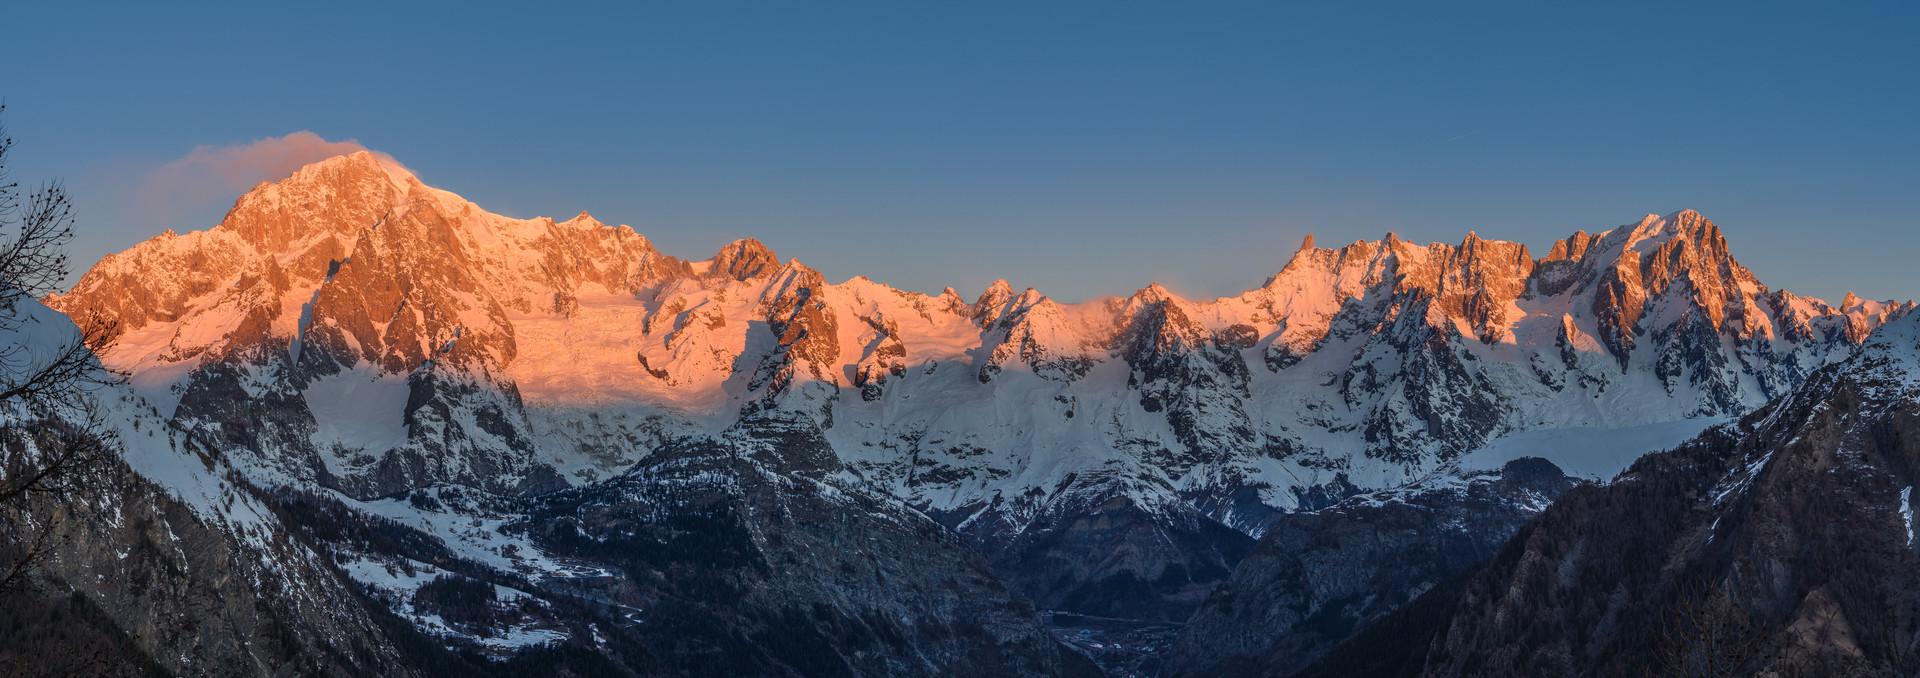 Sunrise | Aosta Valley